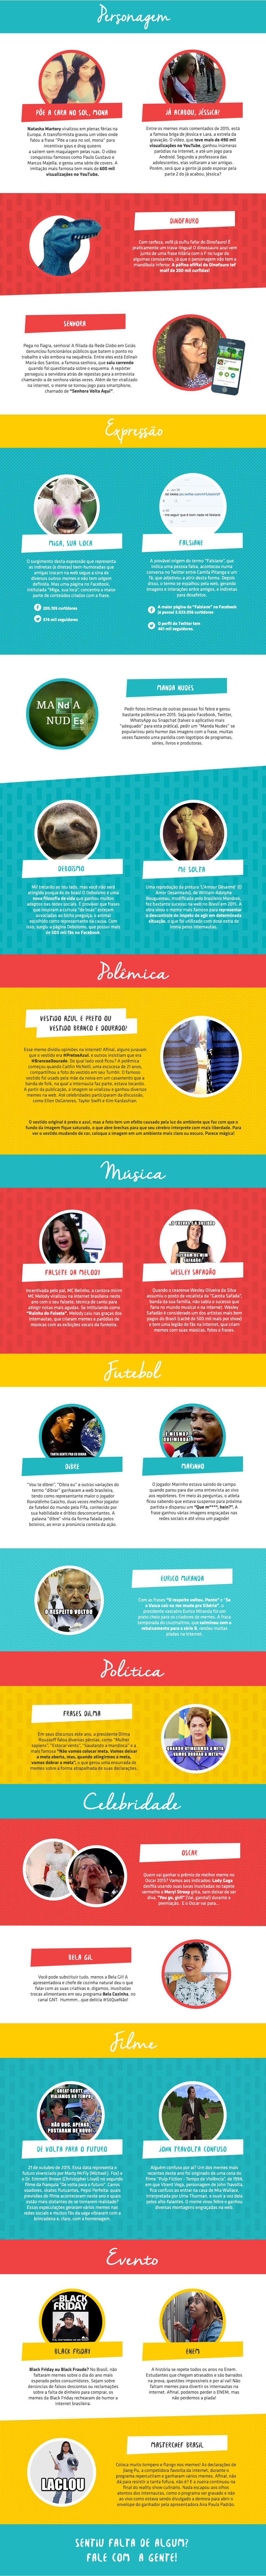 infografico-Memes-2015